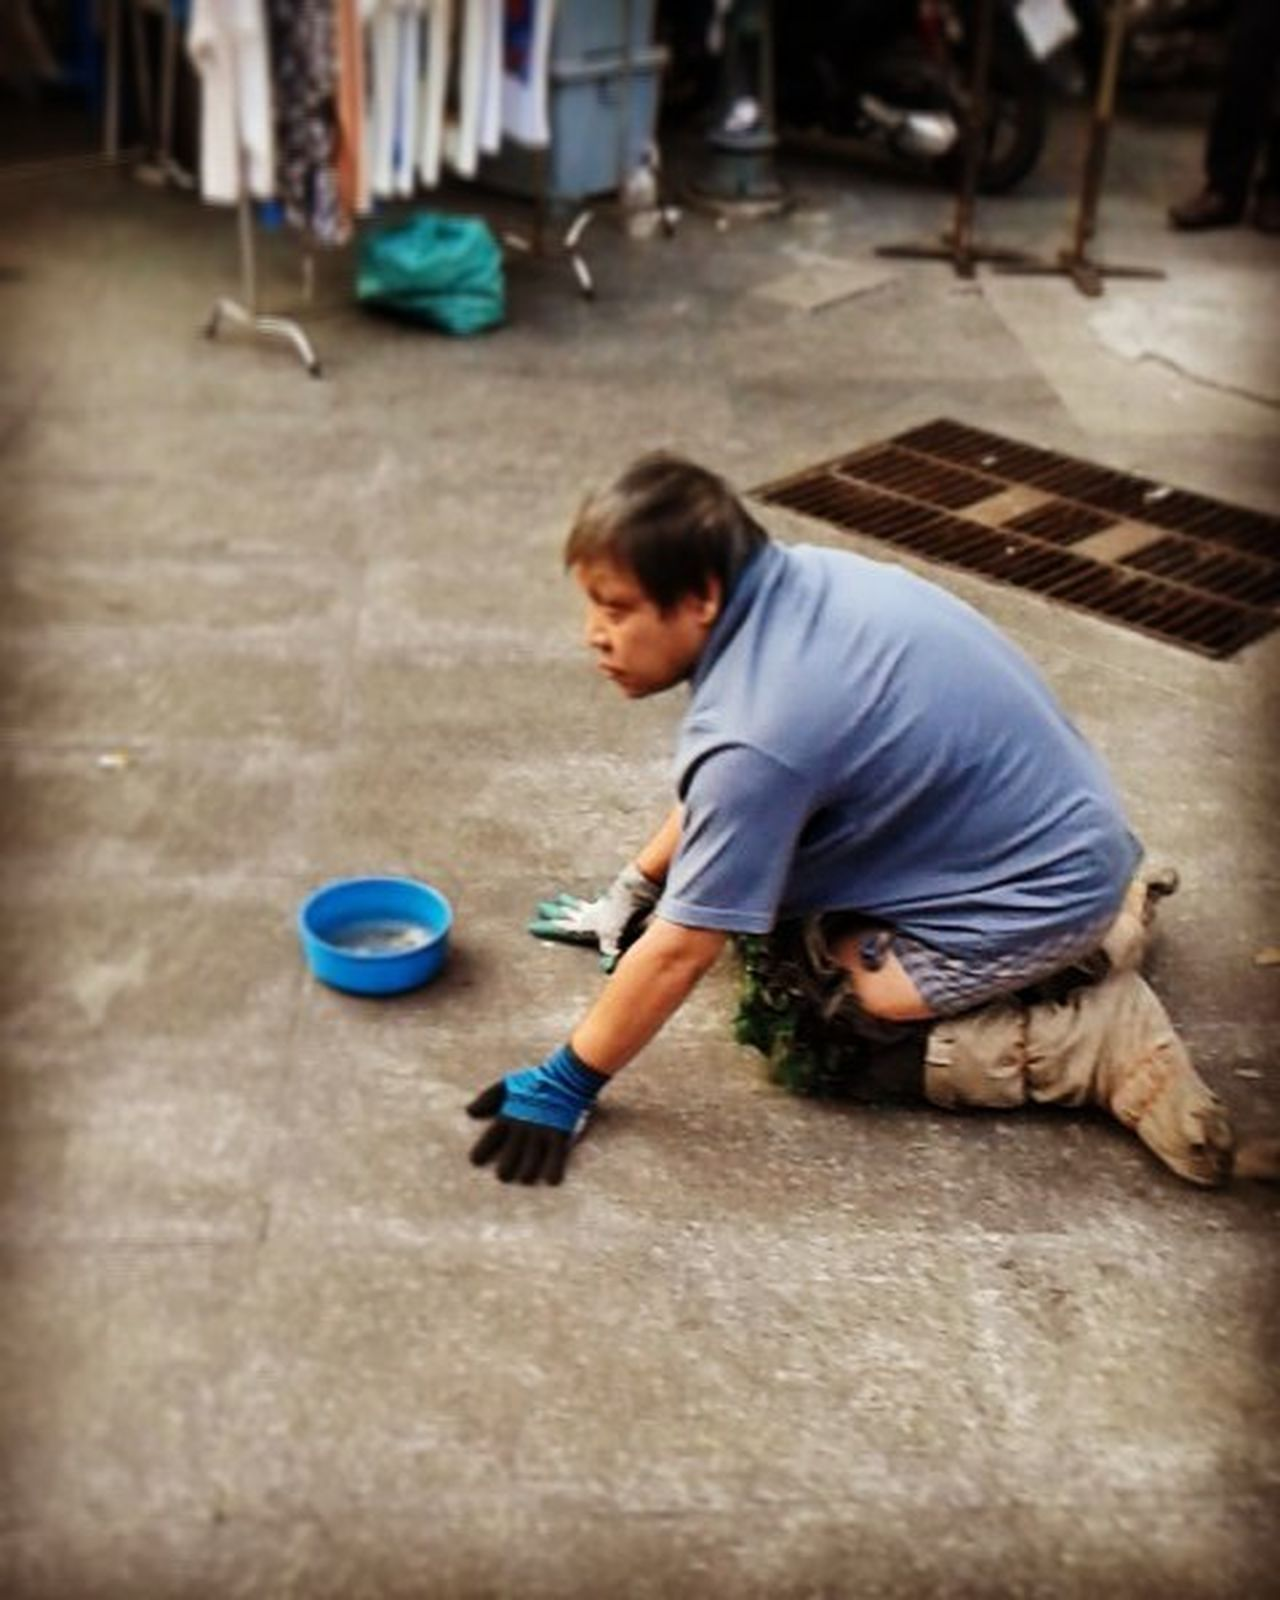 Bagsonmylegs Darksideofeverycity Homeless Begging Poor  Street Unlucky Money Streetphotography Photograthy City Bangkok